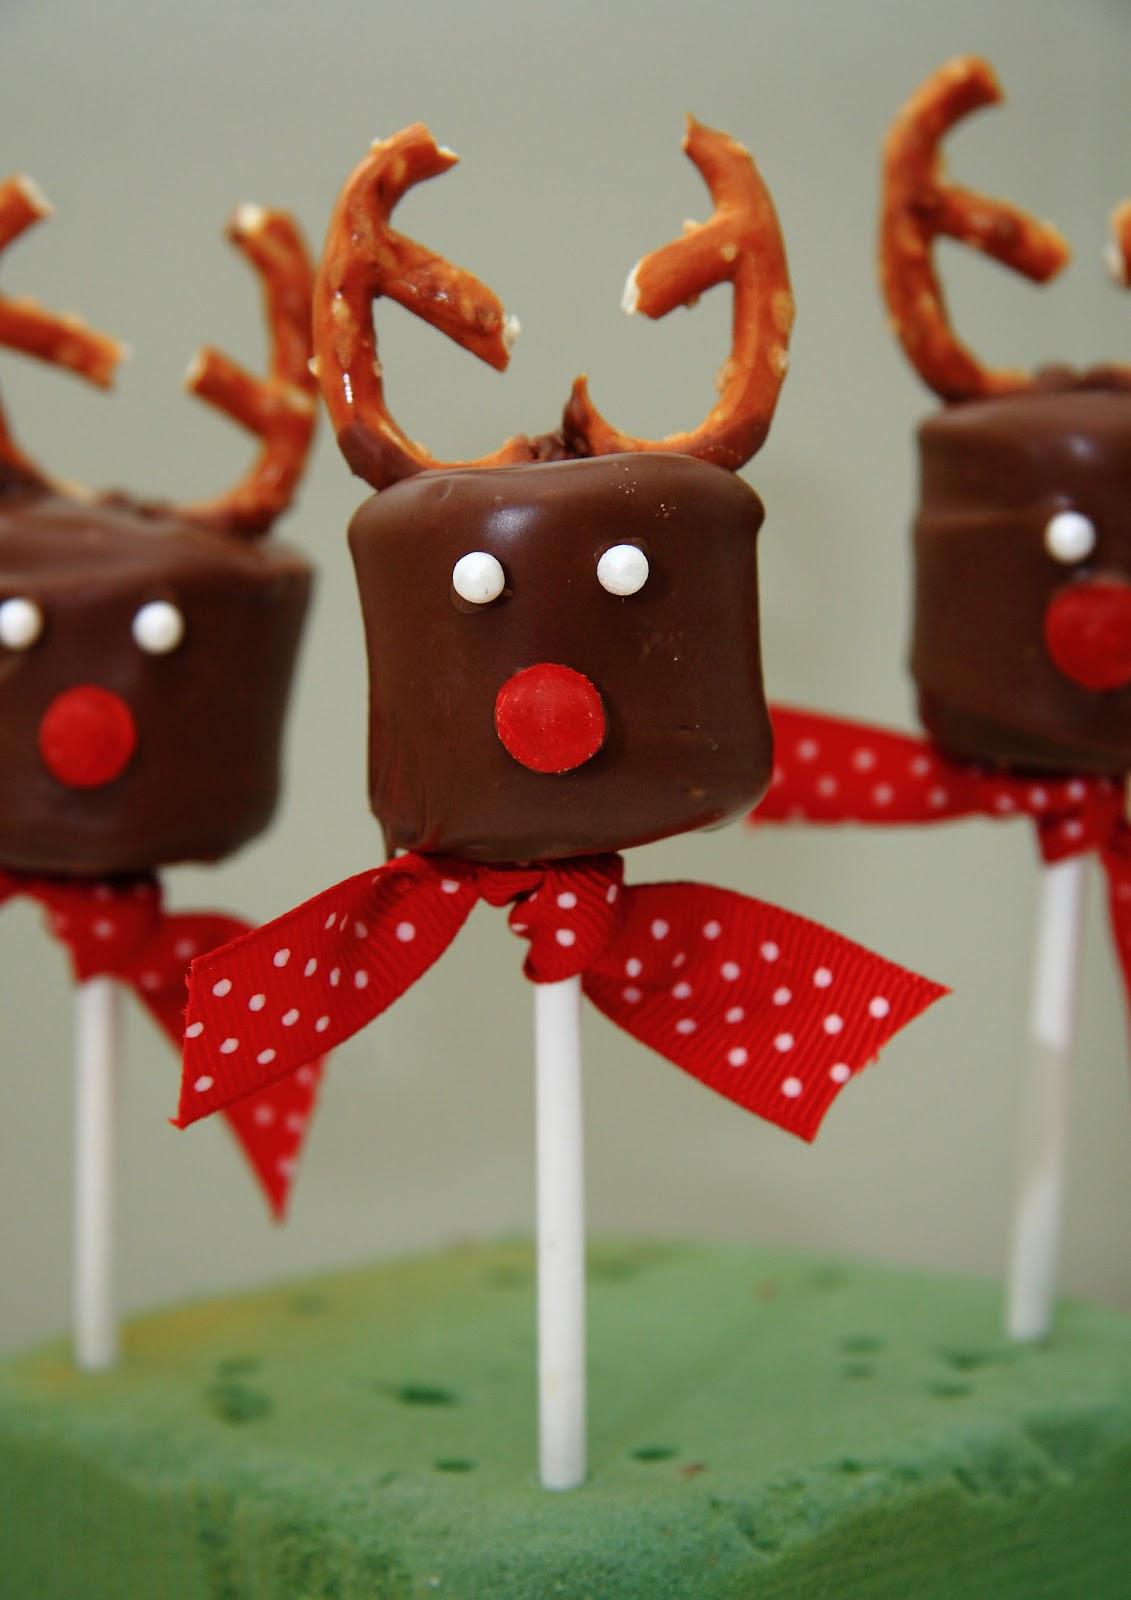 Christmas Baking Ideas For Kids  Betty Crocker Wannabe Recipe and Mom Blog Chocolate